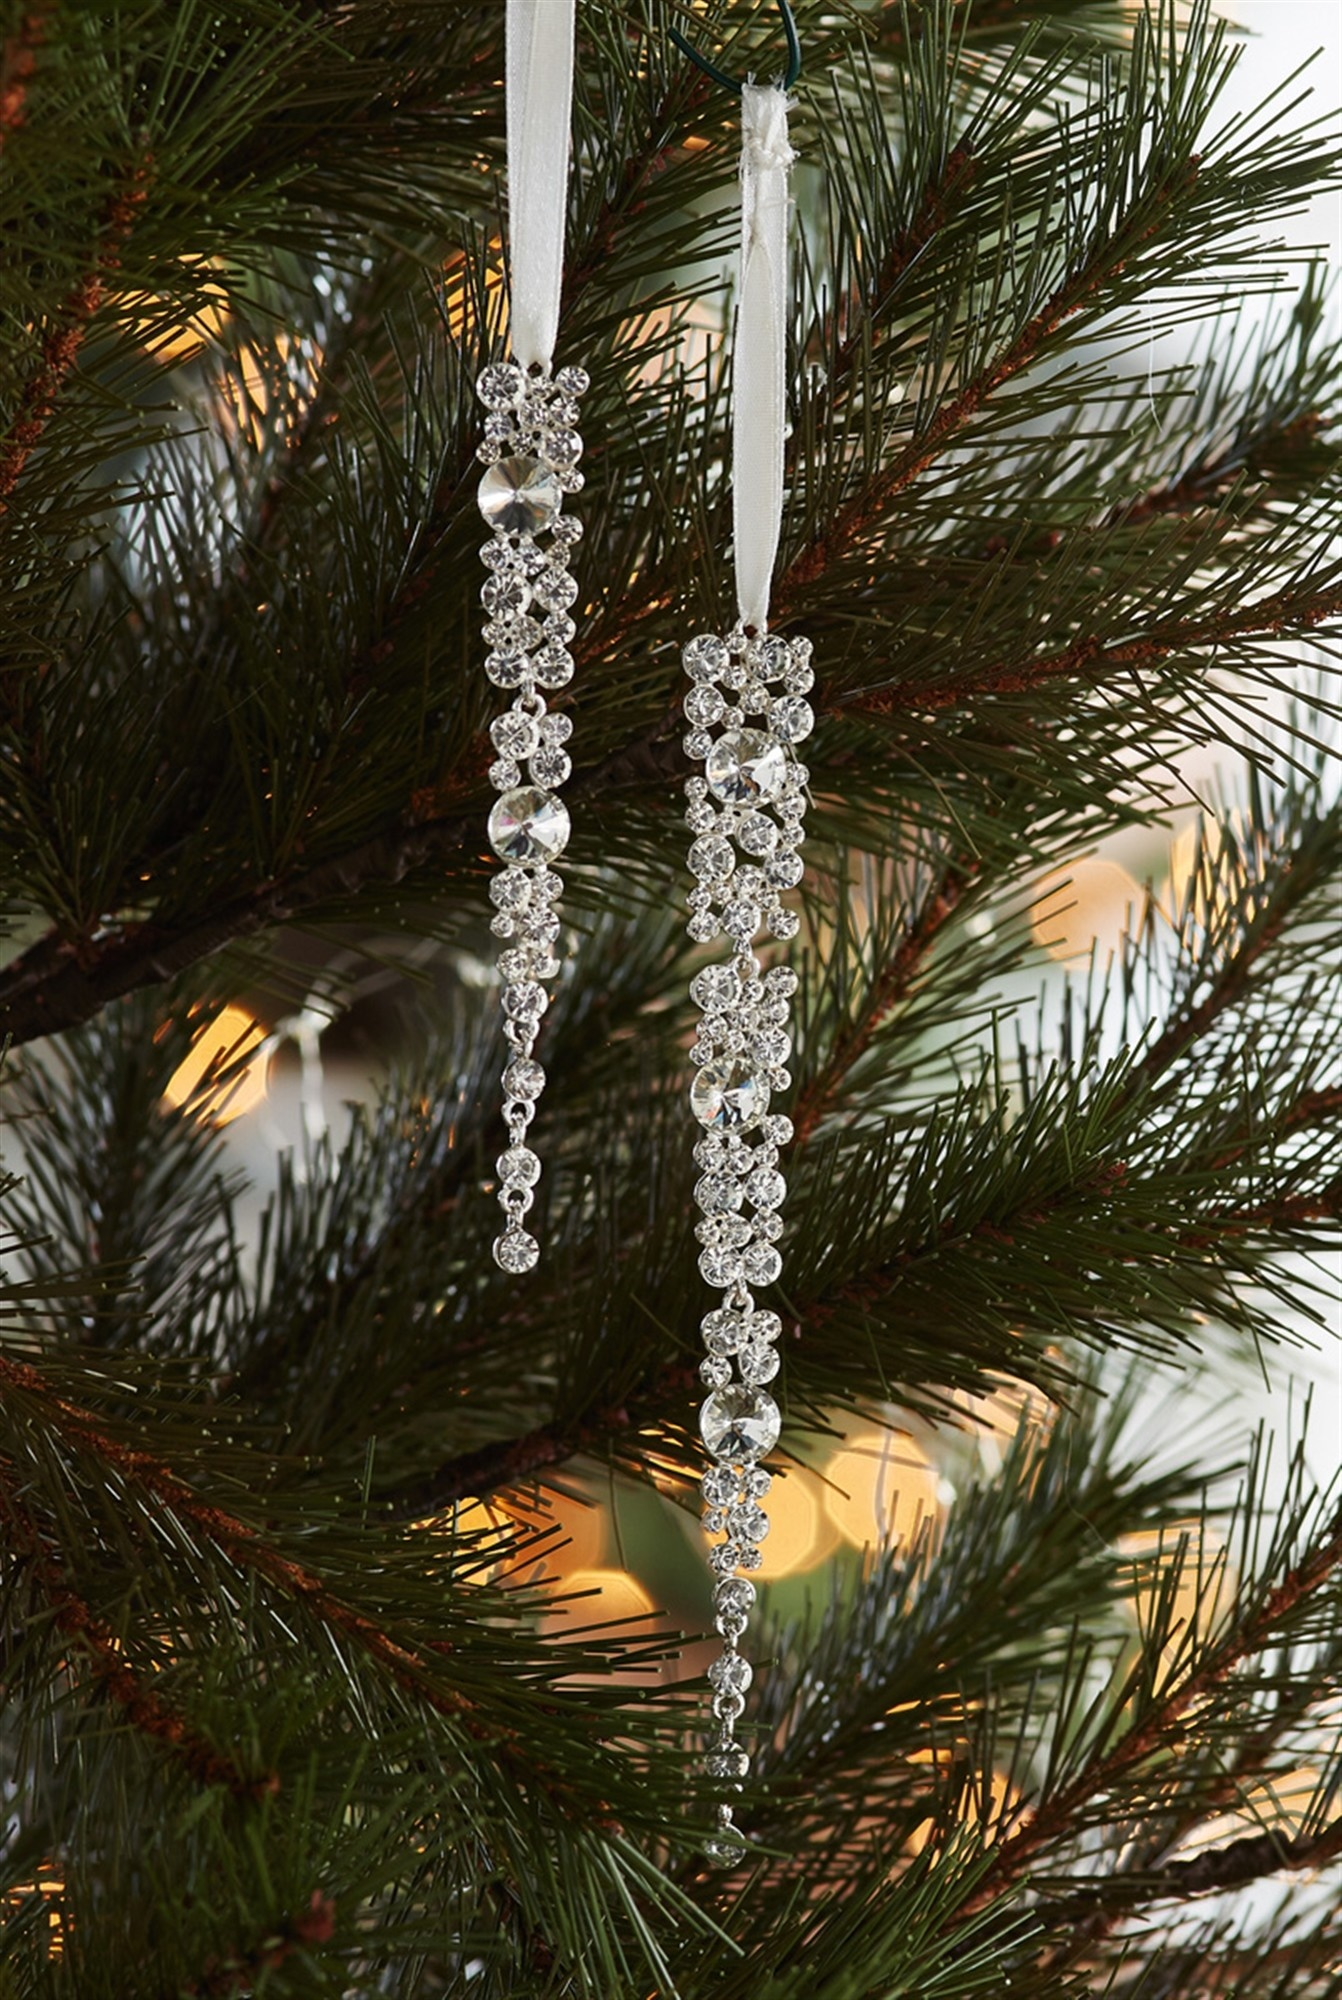 Set of 2 Gem Icicle Ornaments